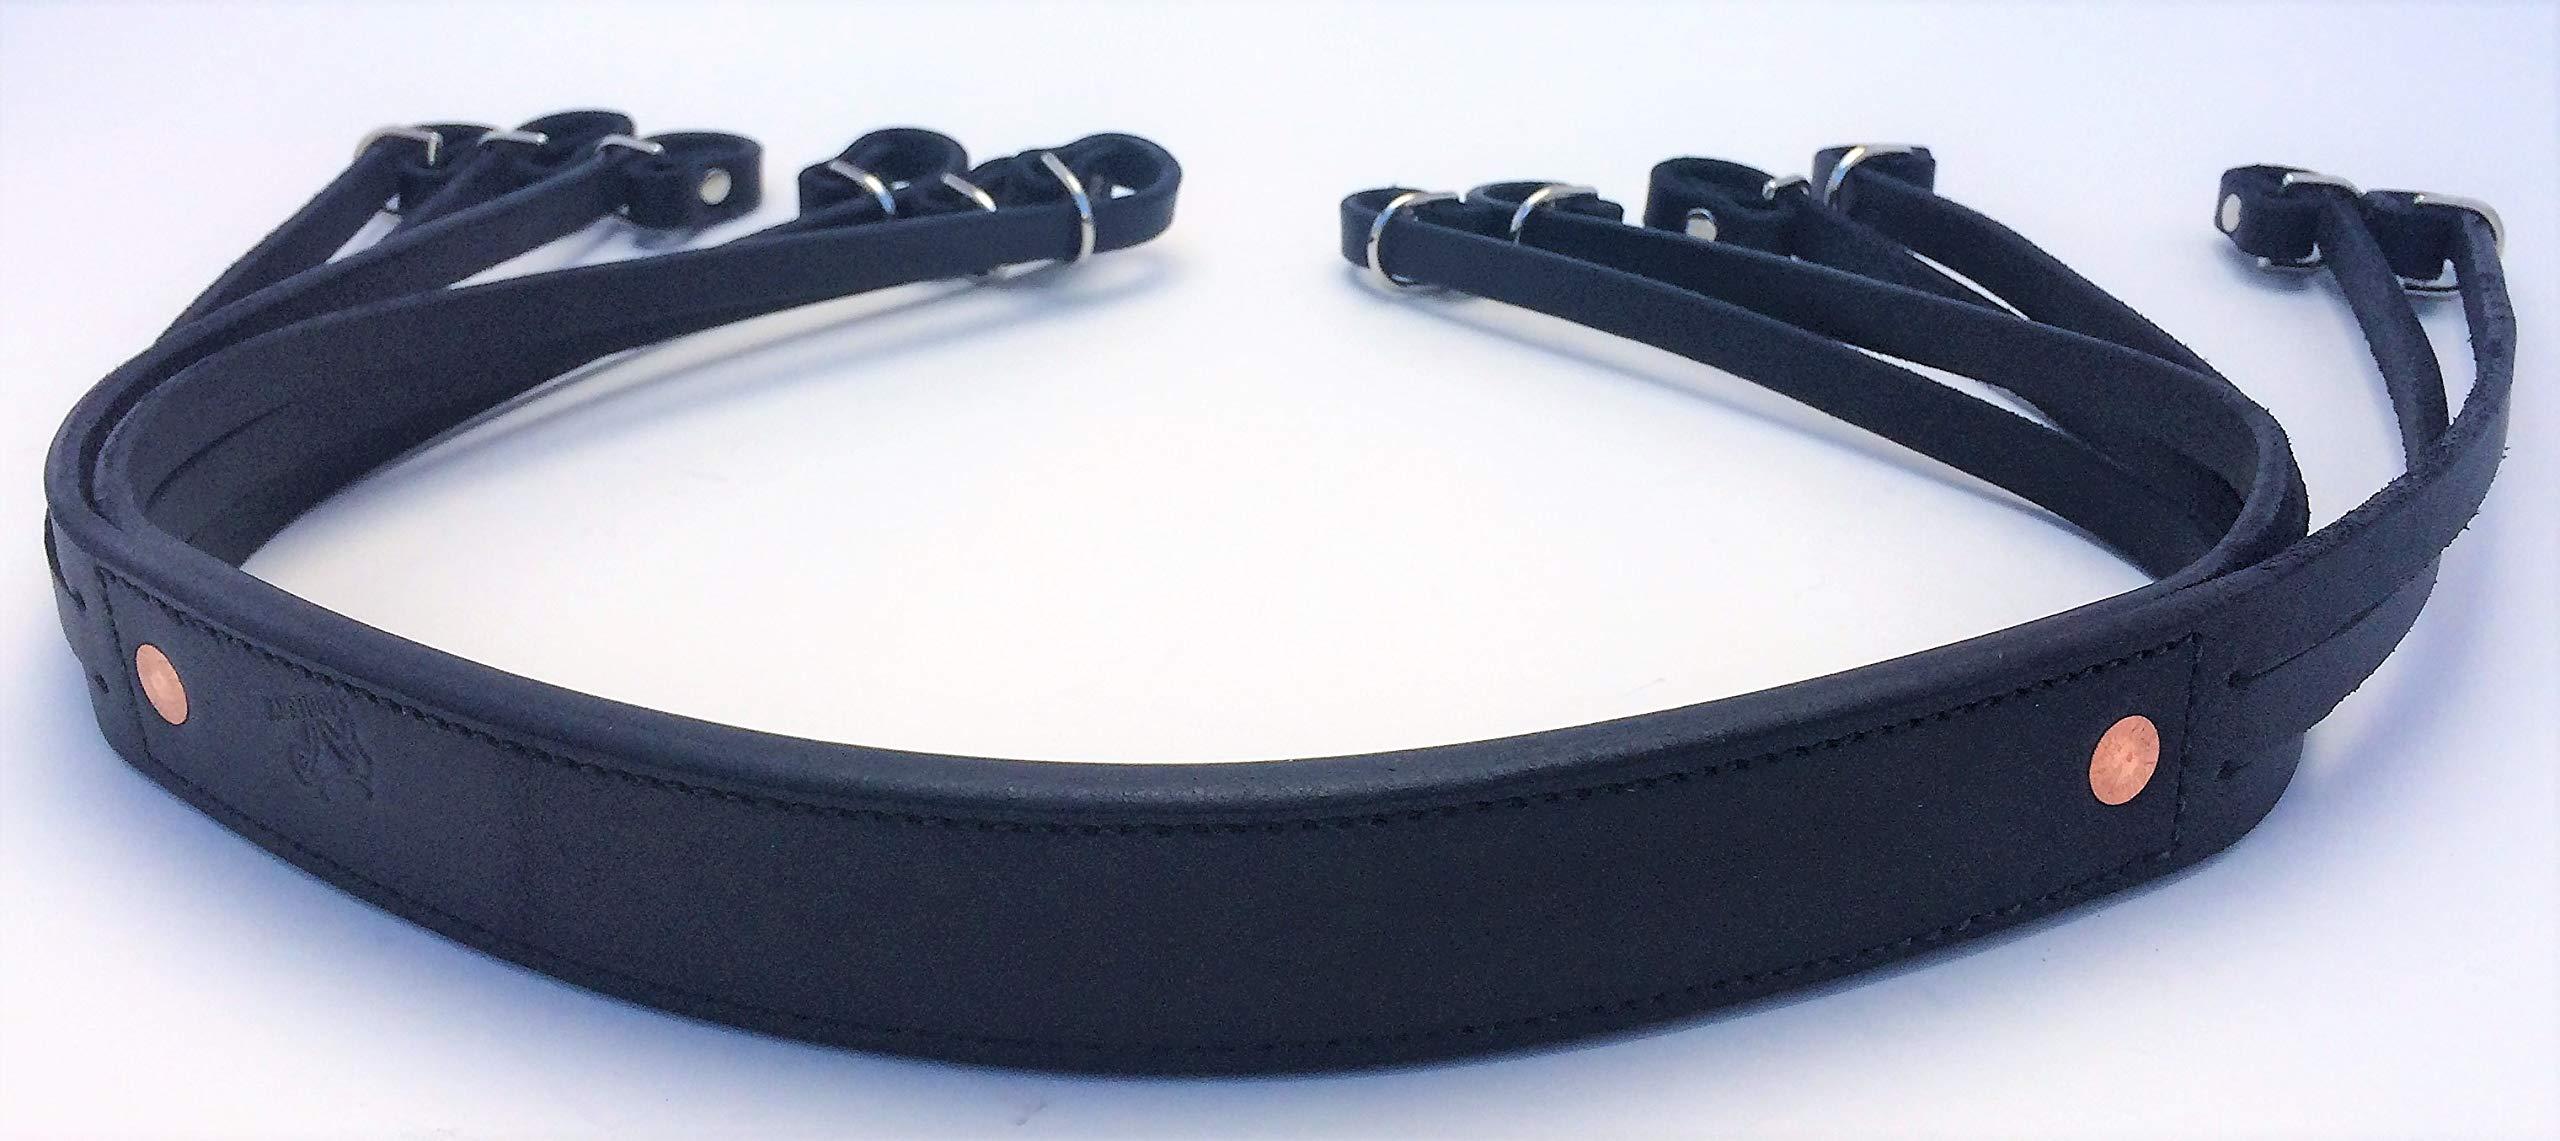 AP Saddlery Low Profile Leather Duck Strap (Black)